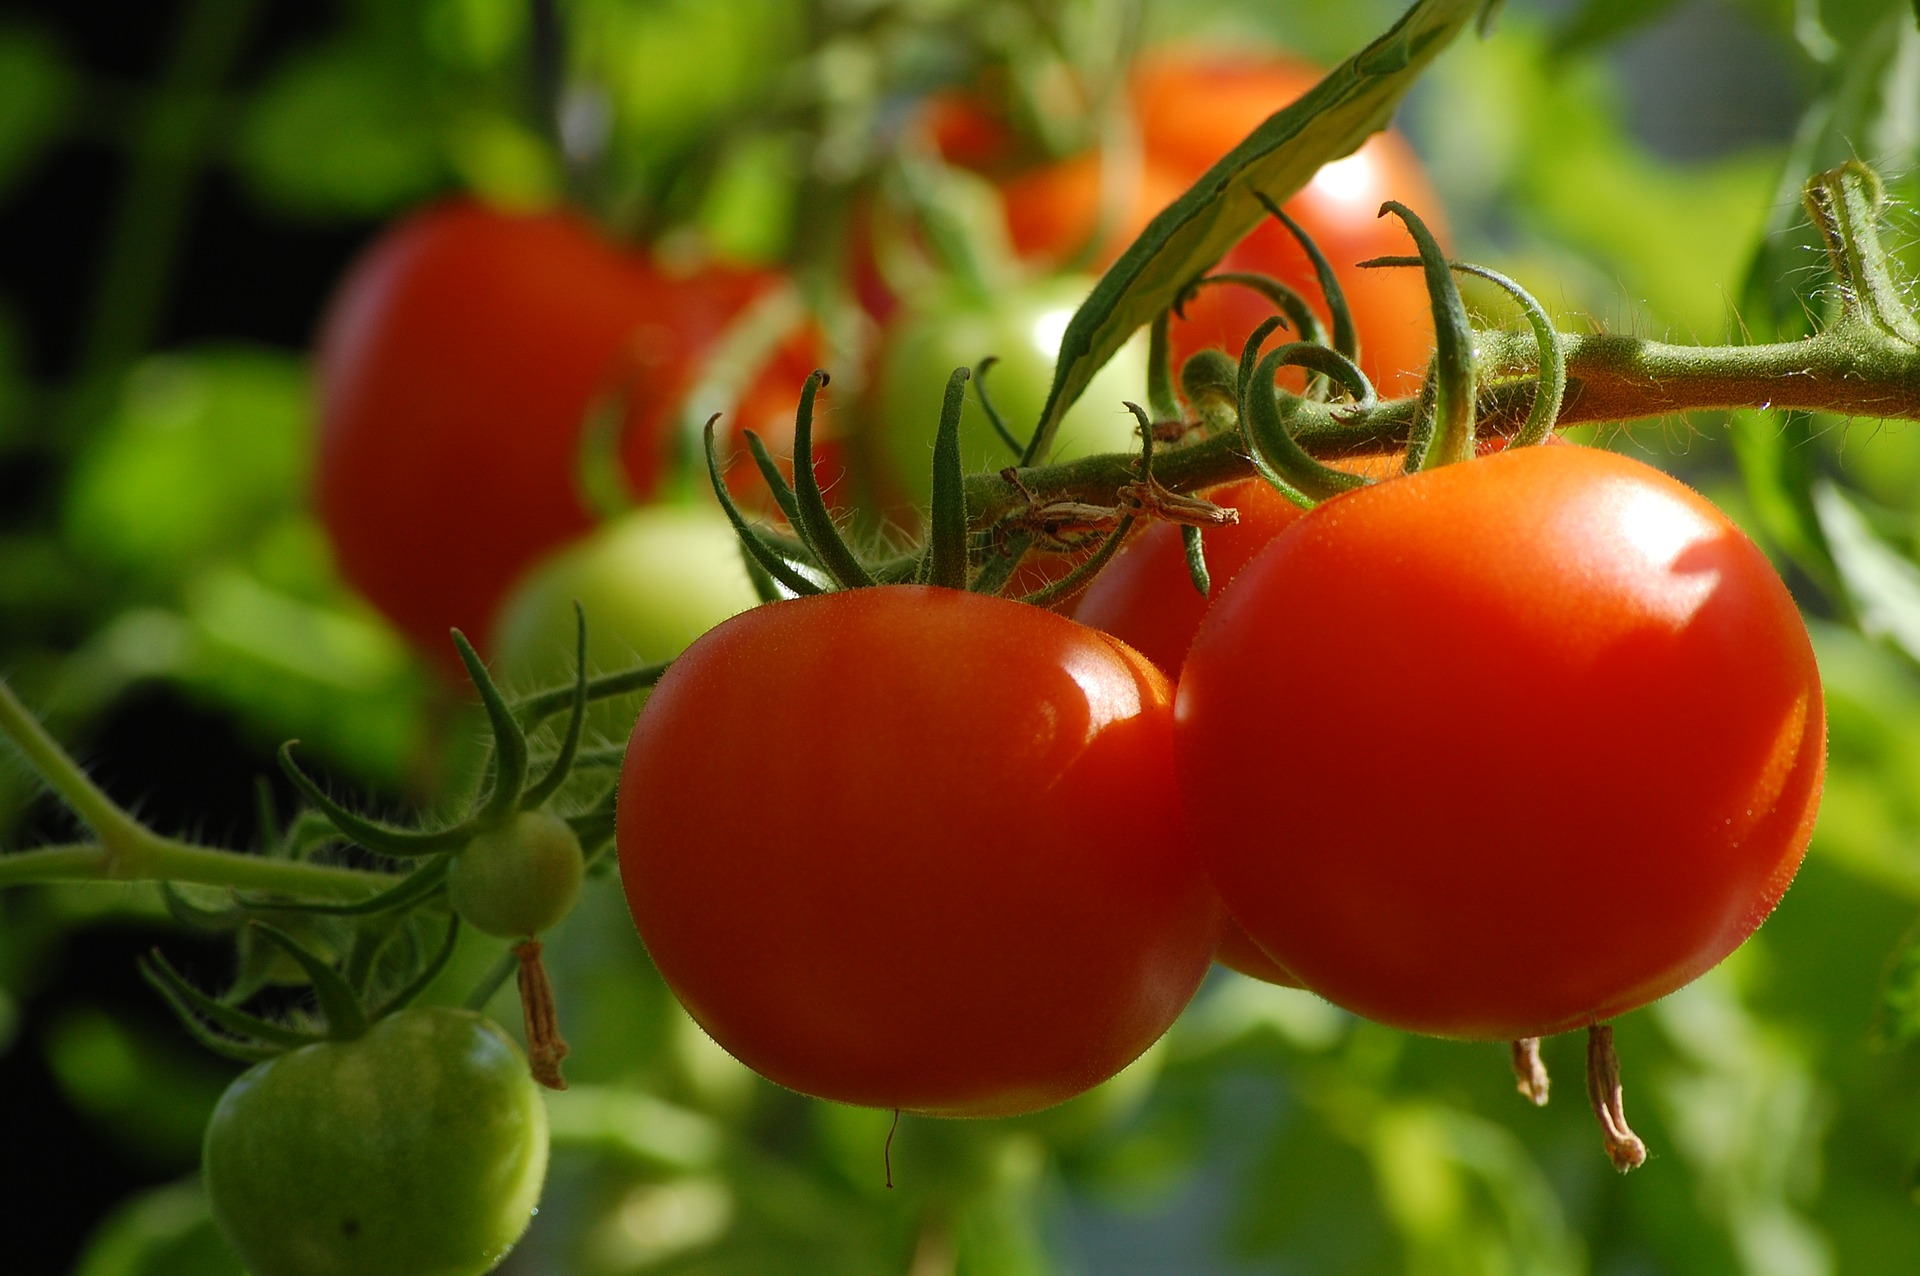 tomato-2643774_1920.jpg